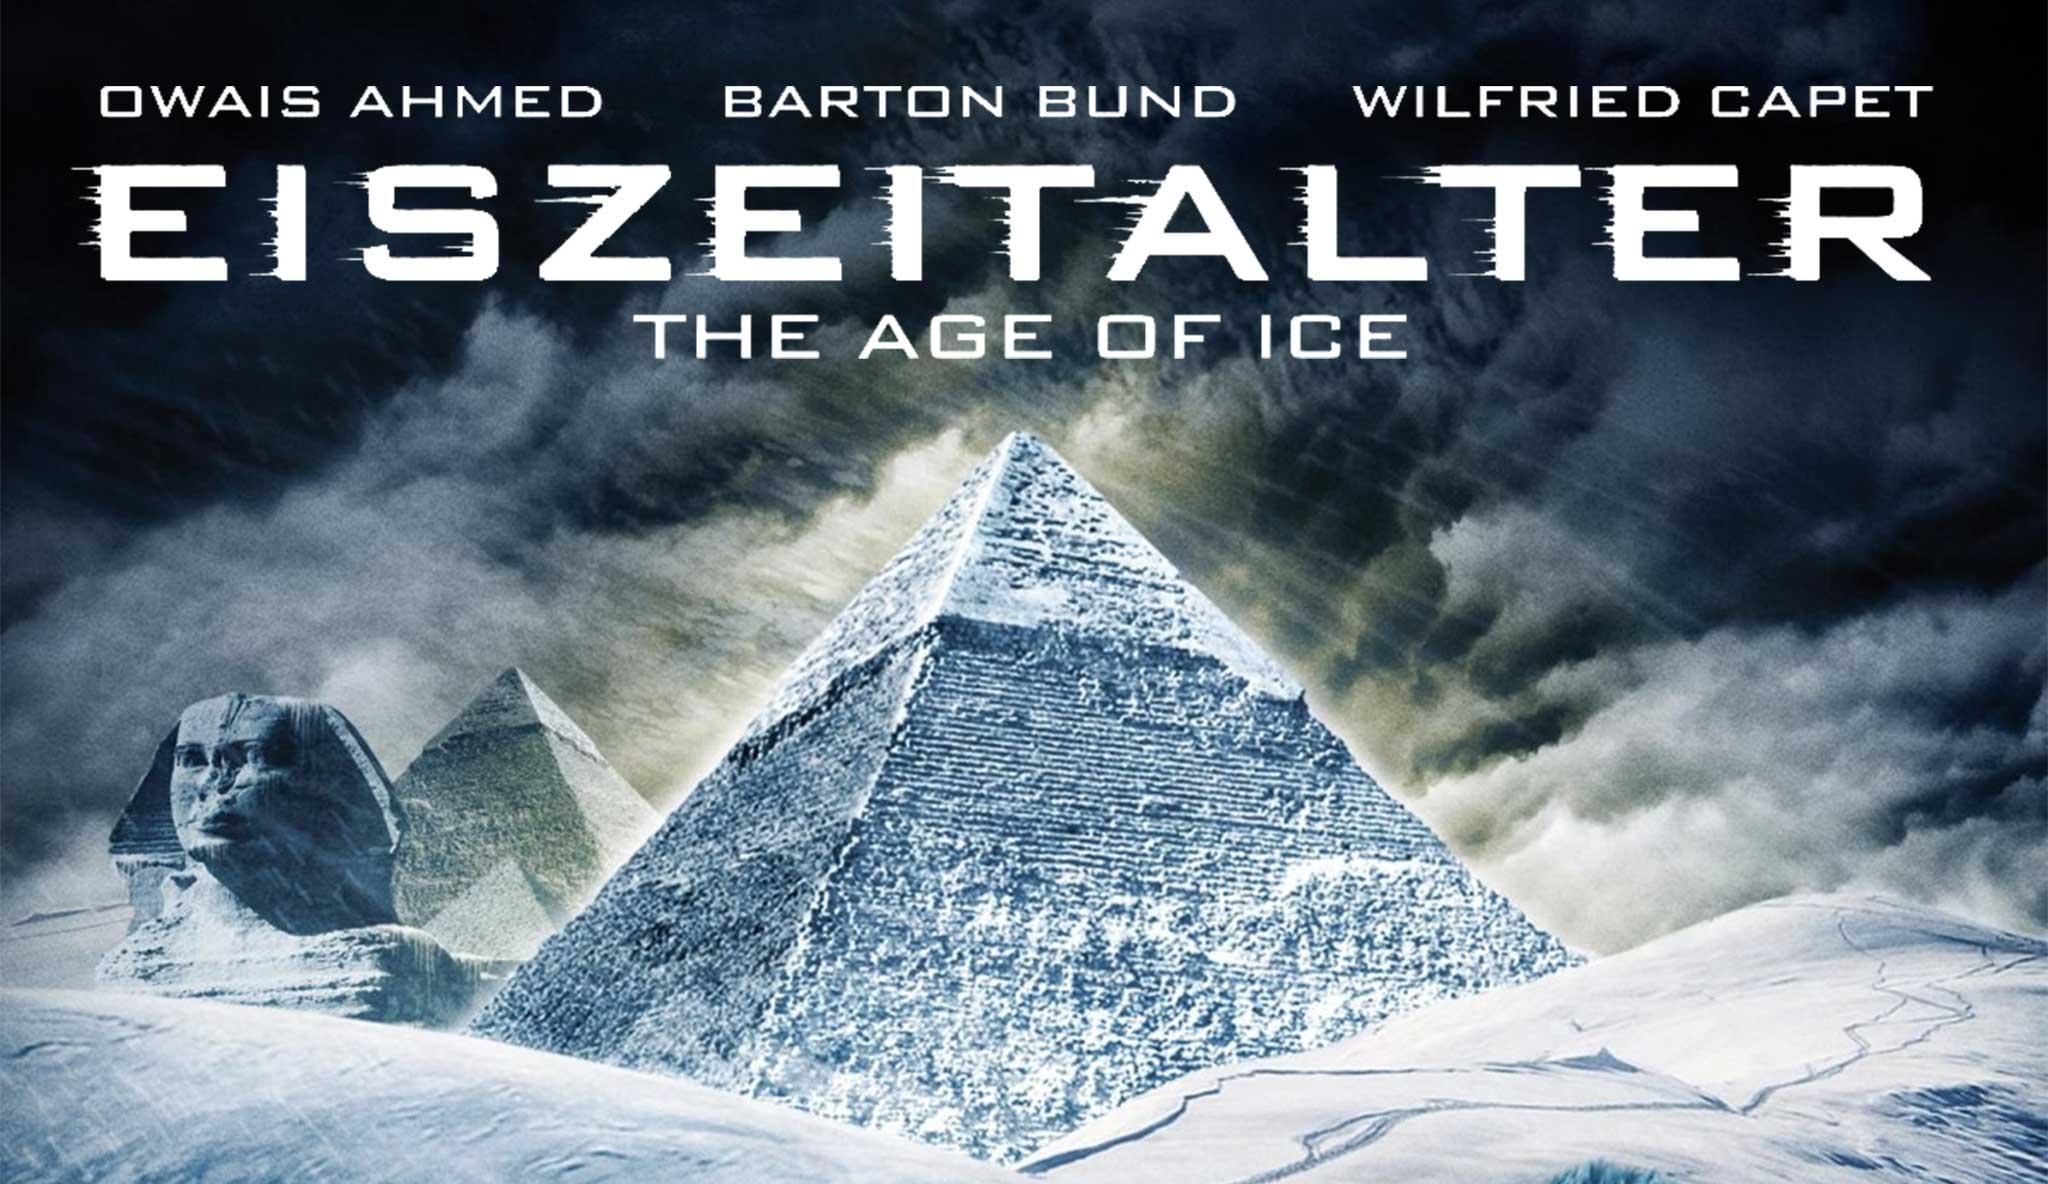 eiszeitalter-the-age-of-ice\header.jpg